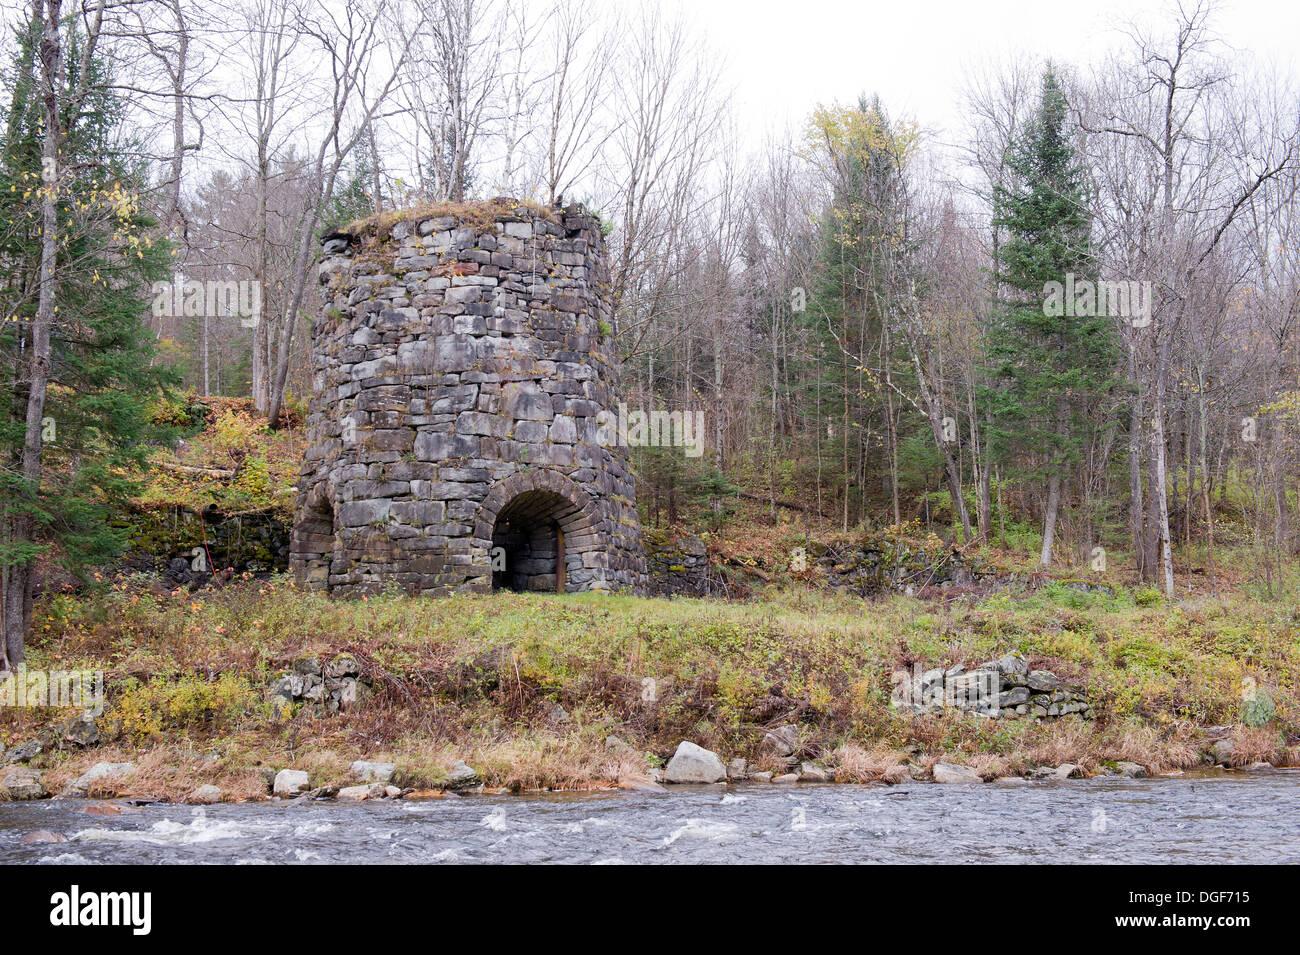 blast furnace smelting iron ore stock photos u0026 blast furnace